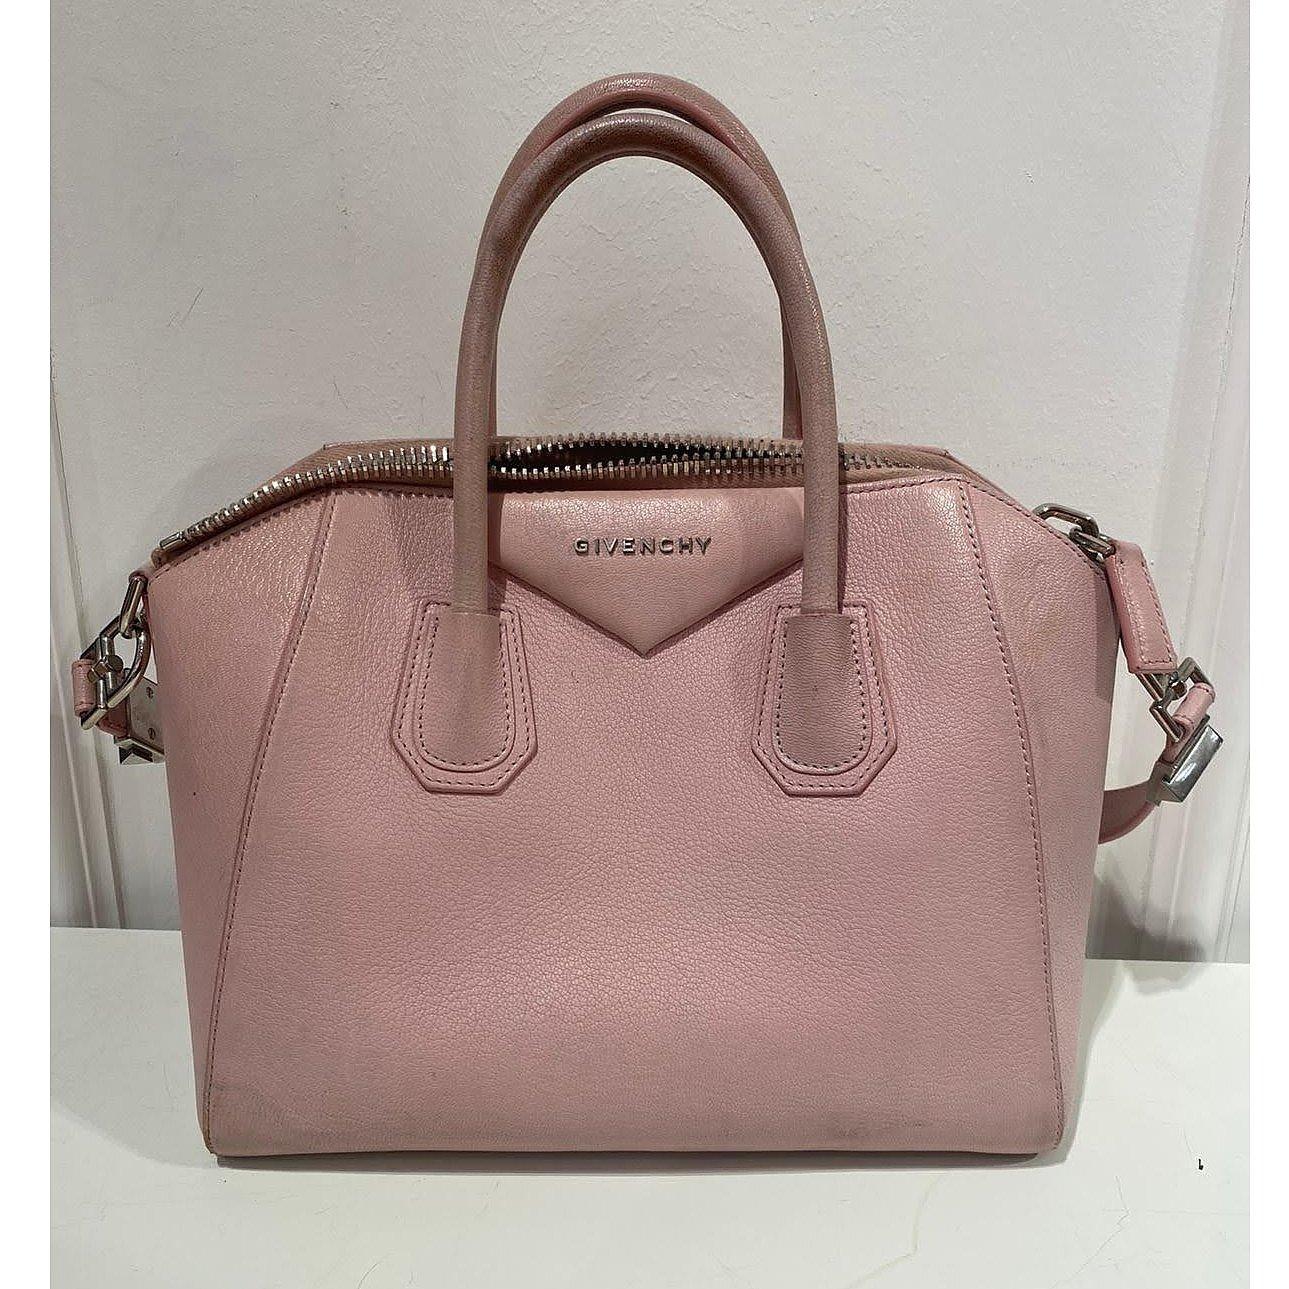 Givenchy Leather Antigonia Bag